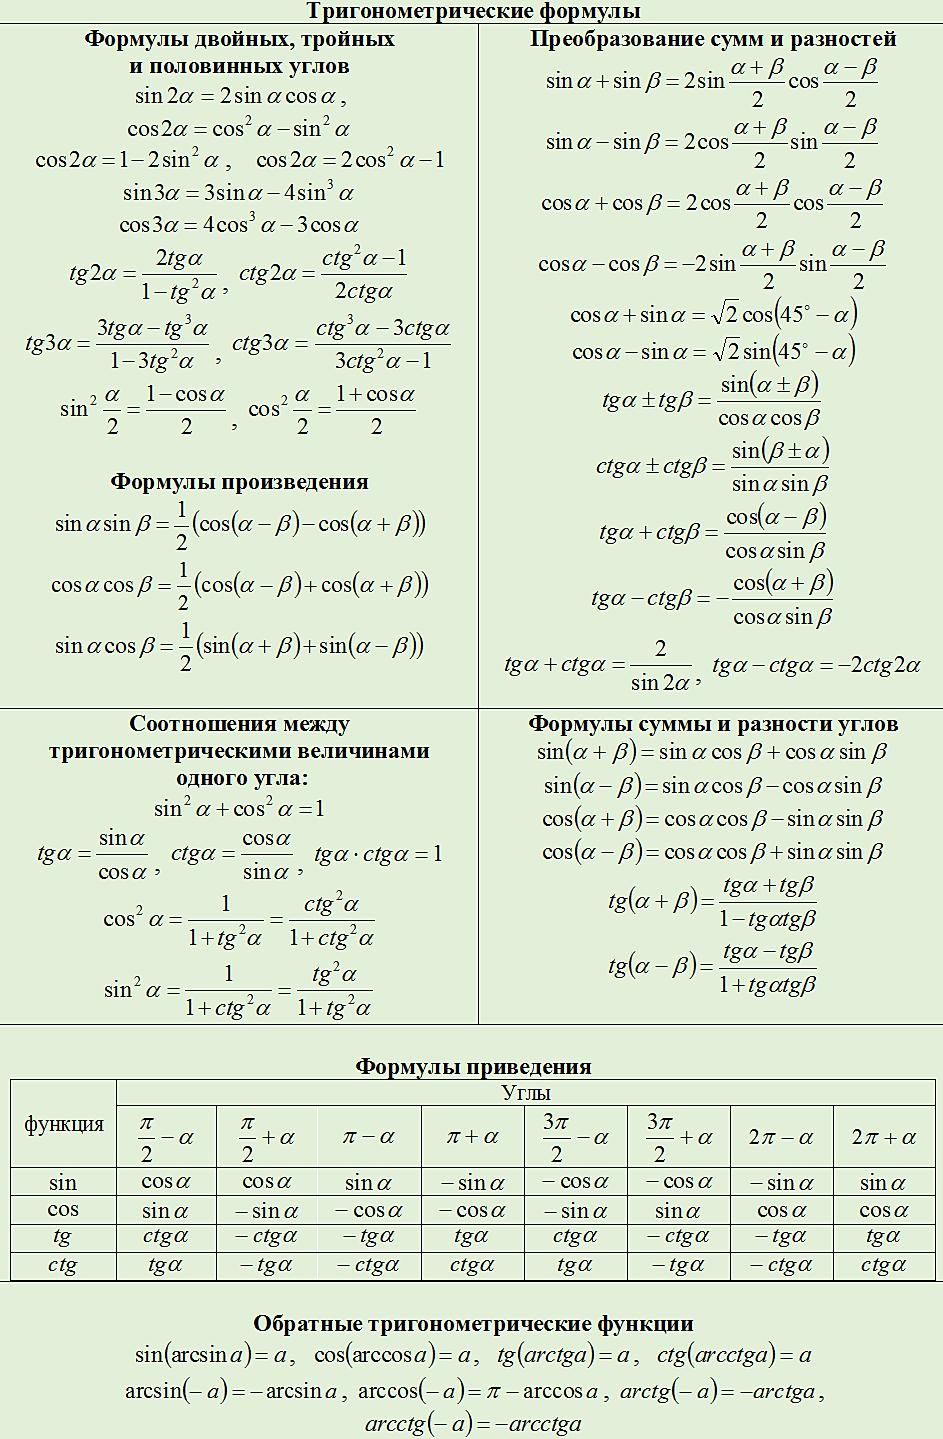 Шпаргалки тригонометрических уравнений